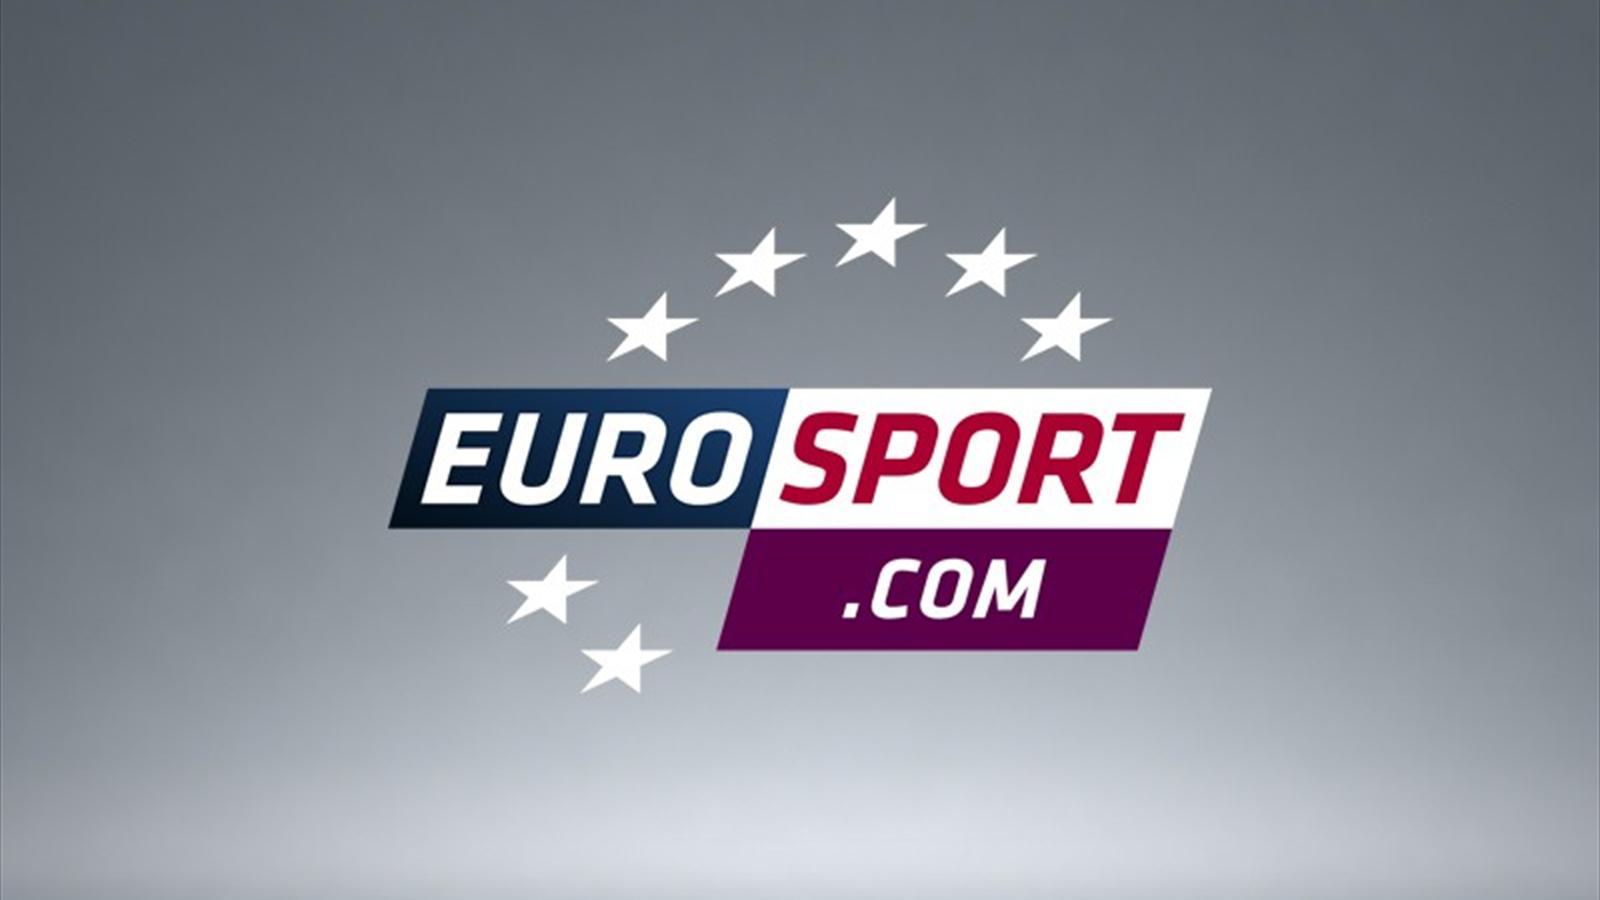 Спортивные каналы онлайн 1 фотография